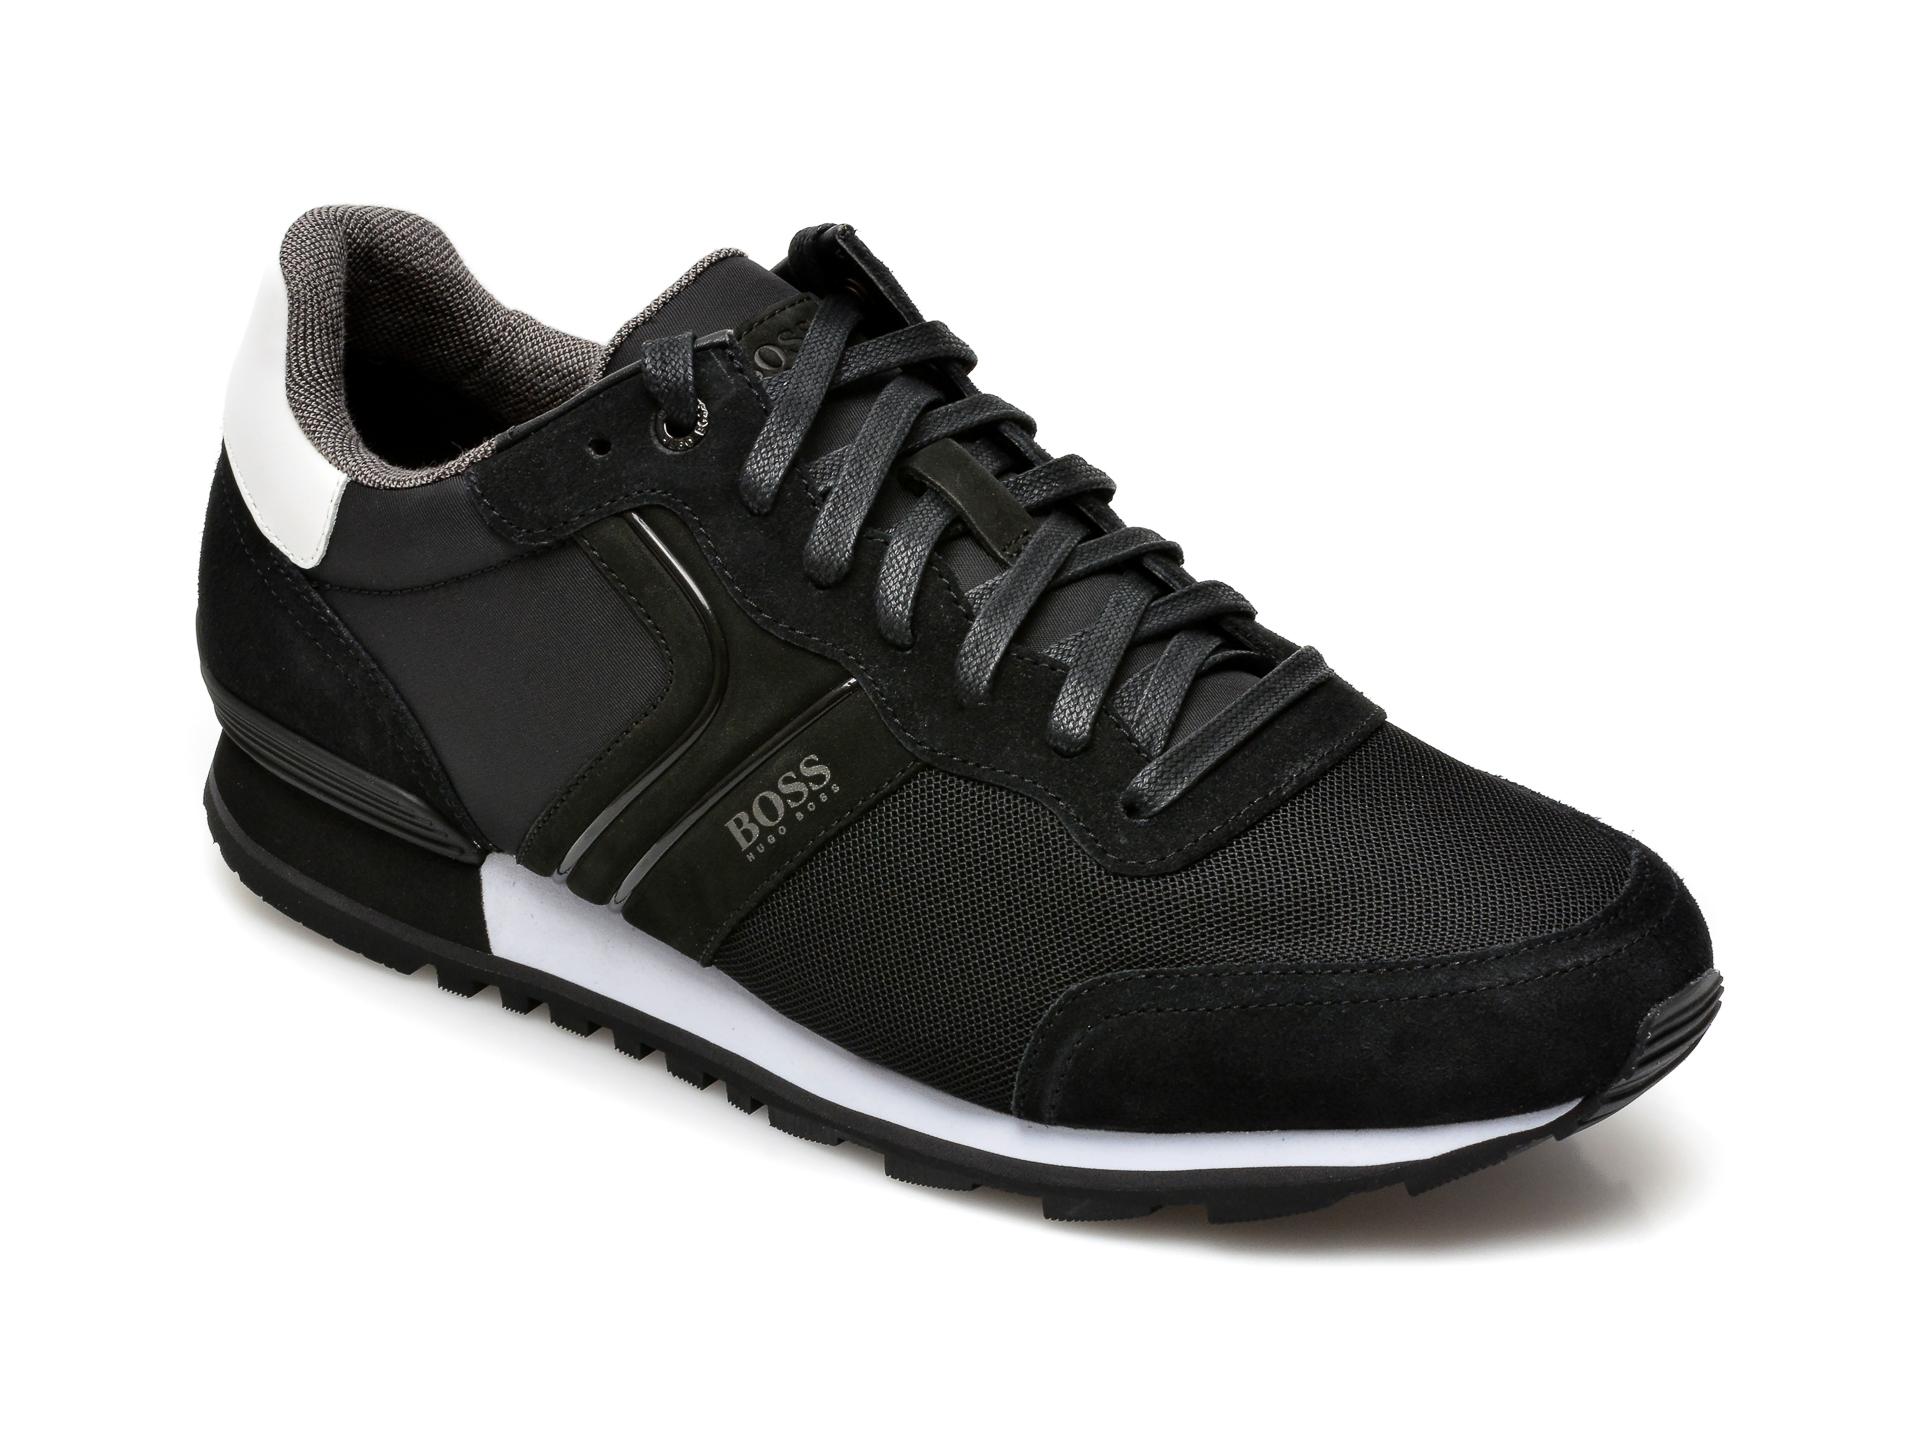 Pantofi sport HUGO BOSS negri, 3661, din material textil si piele naturala imagine